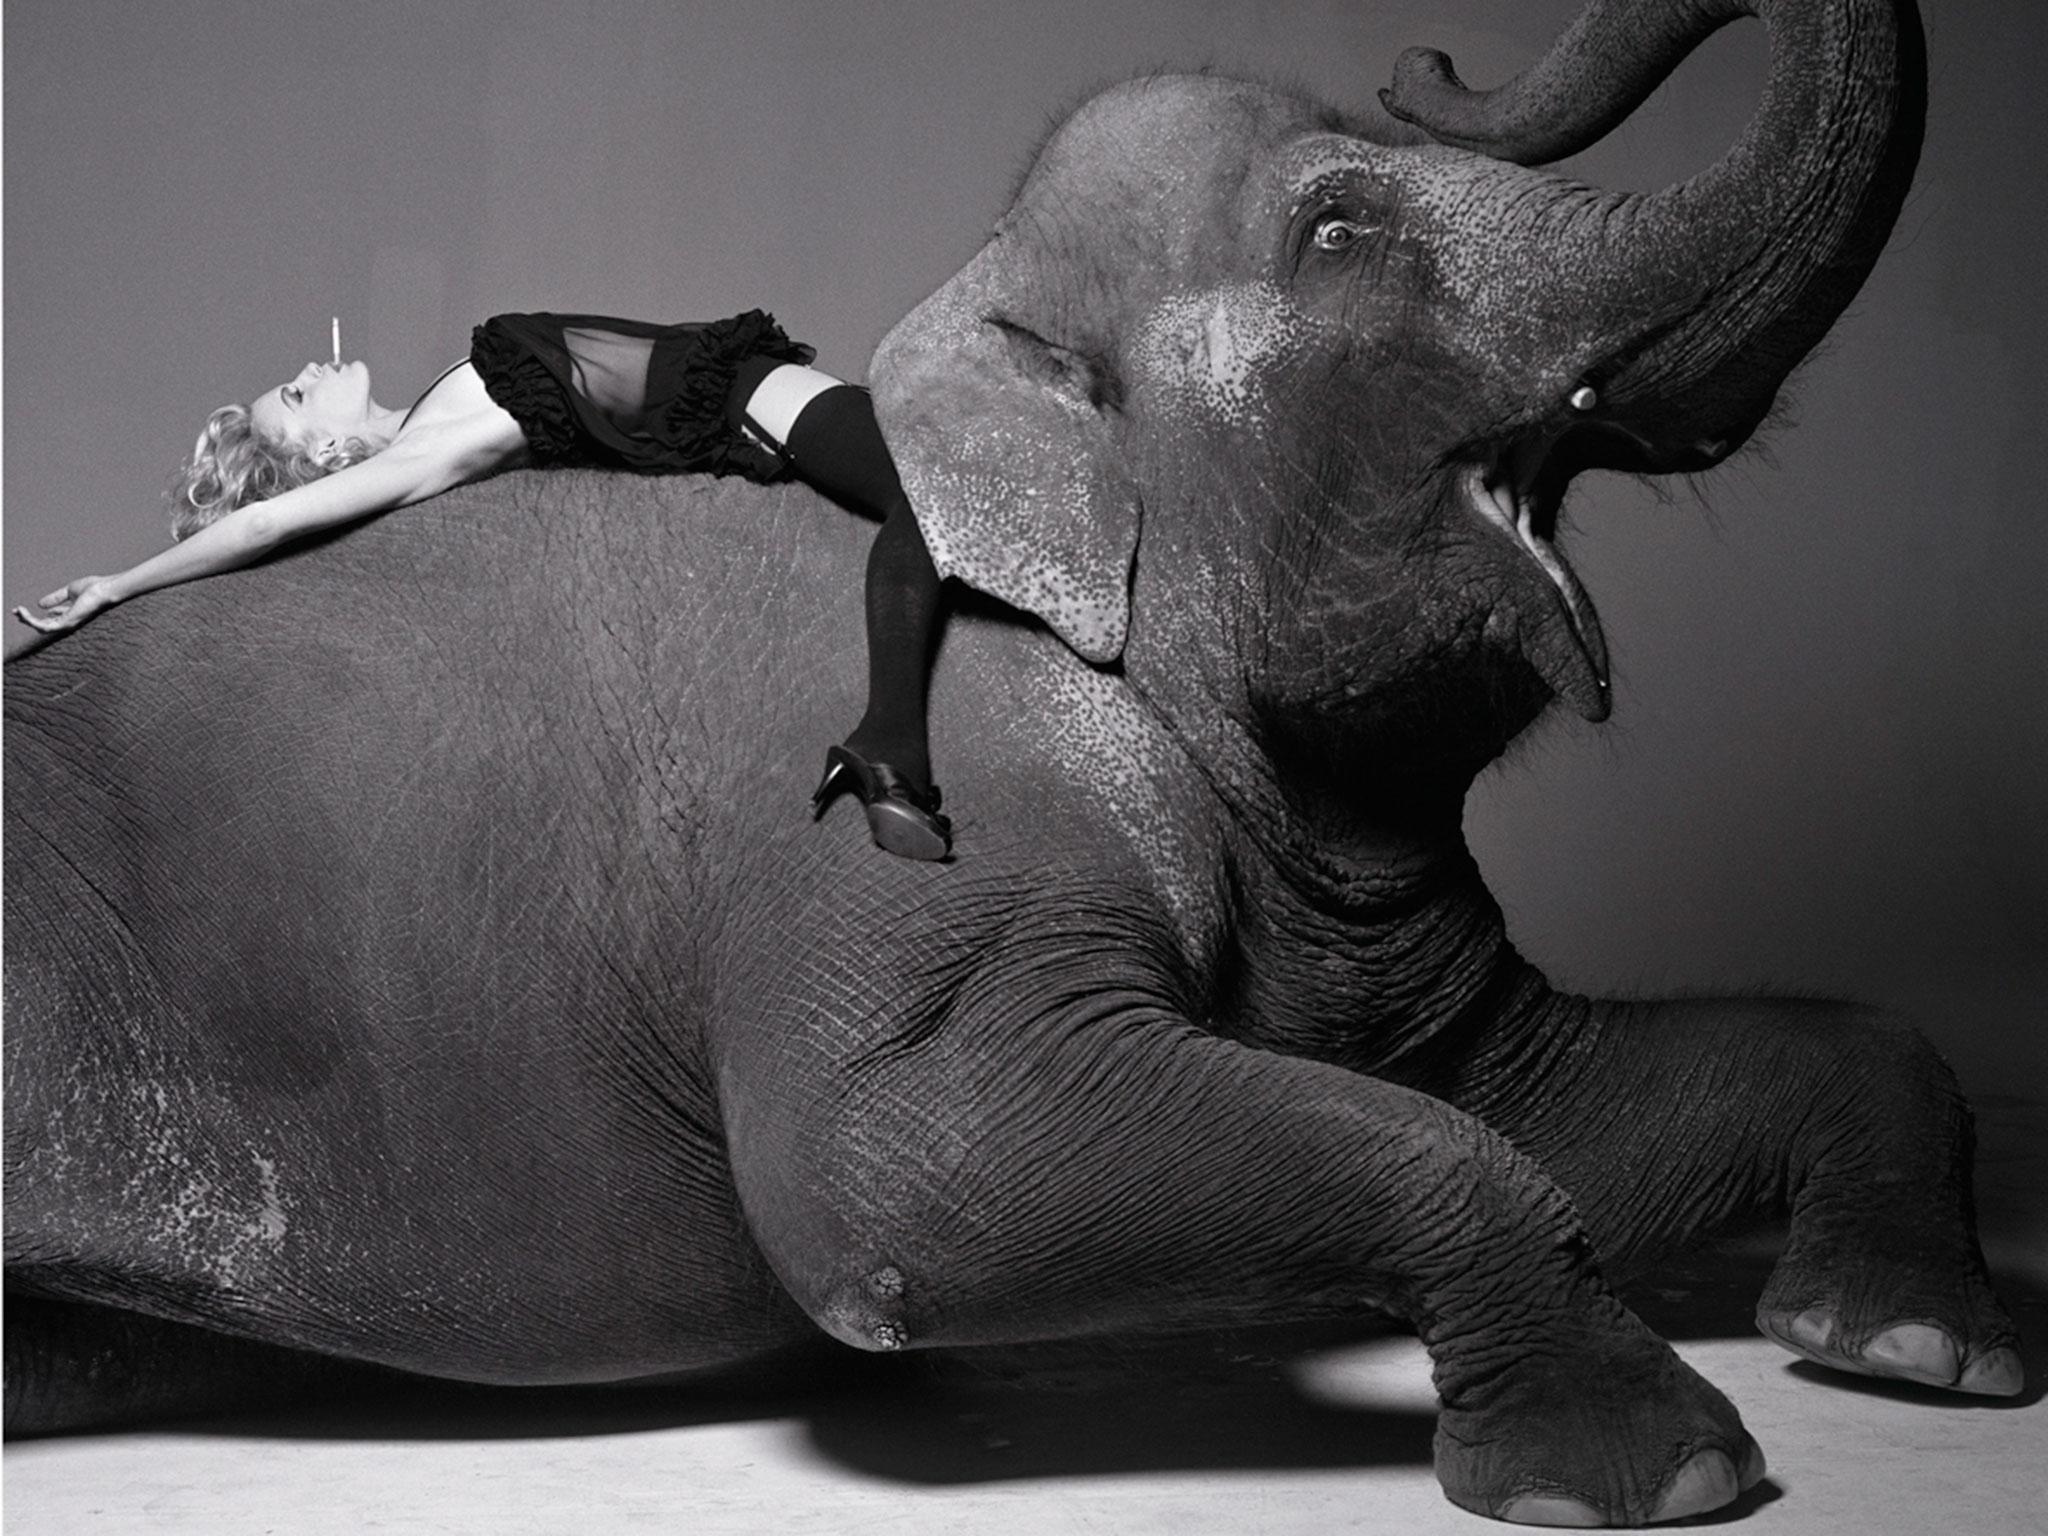 elephant-fashion-editorial-photography.jpg